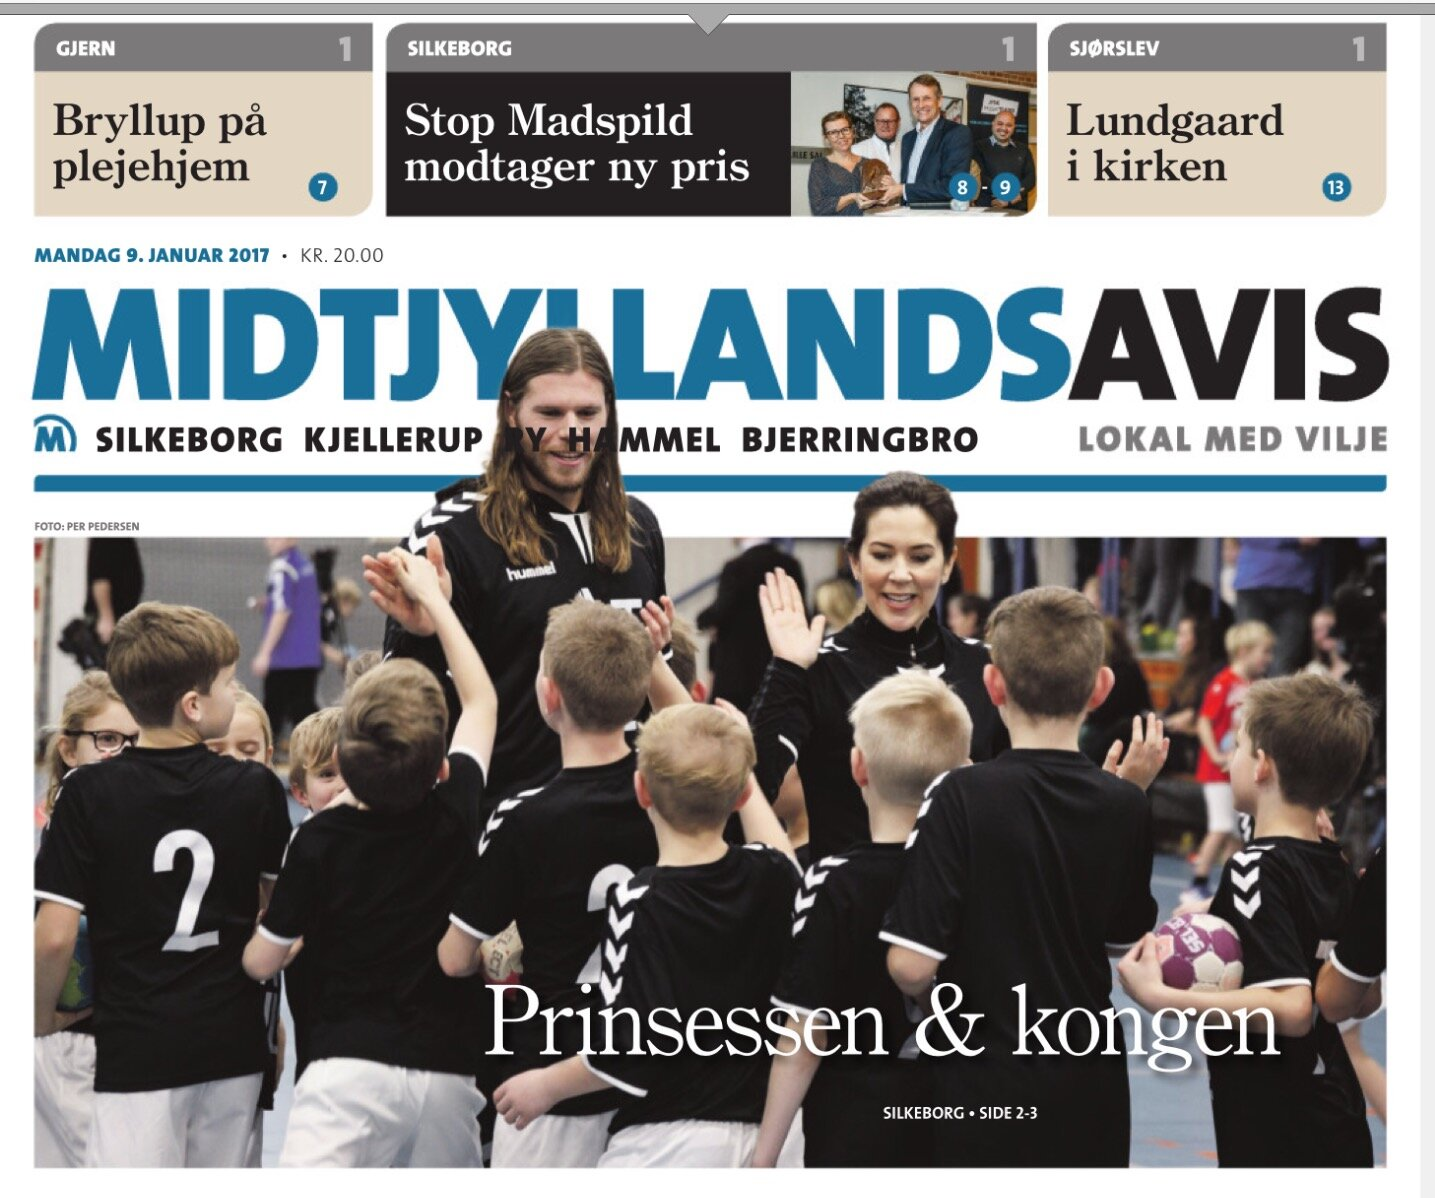 Coverpage Midtjyllands Avis